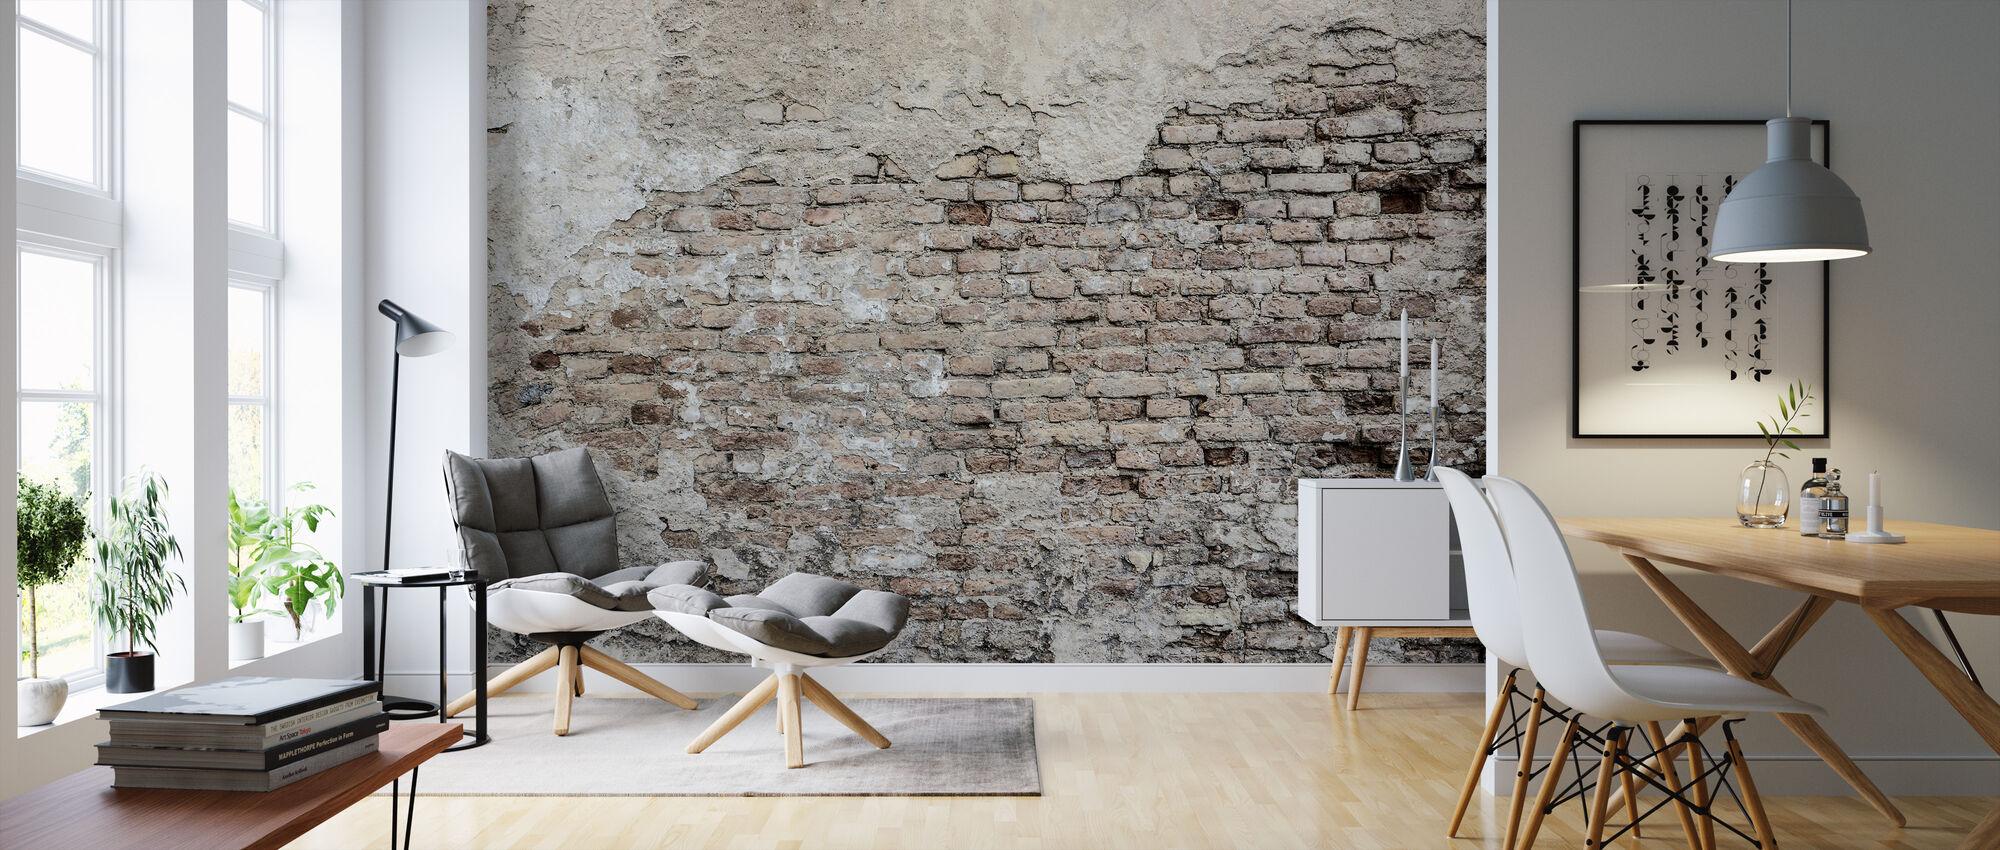 Gamle Brickwall - Tapet - Stue